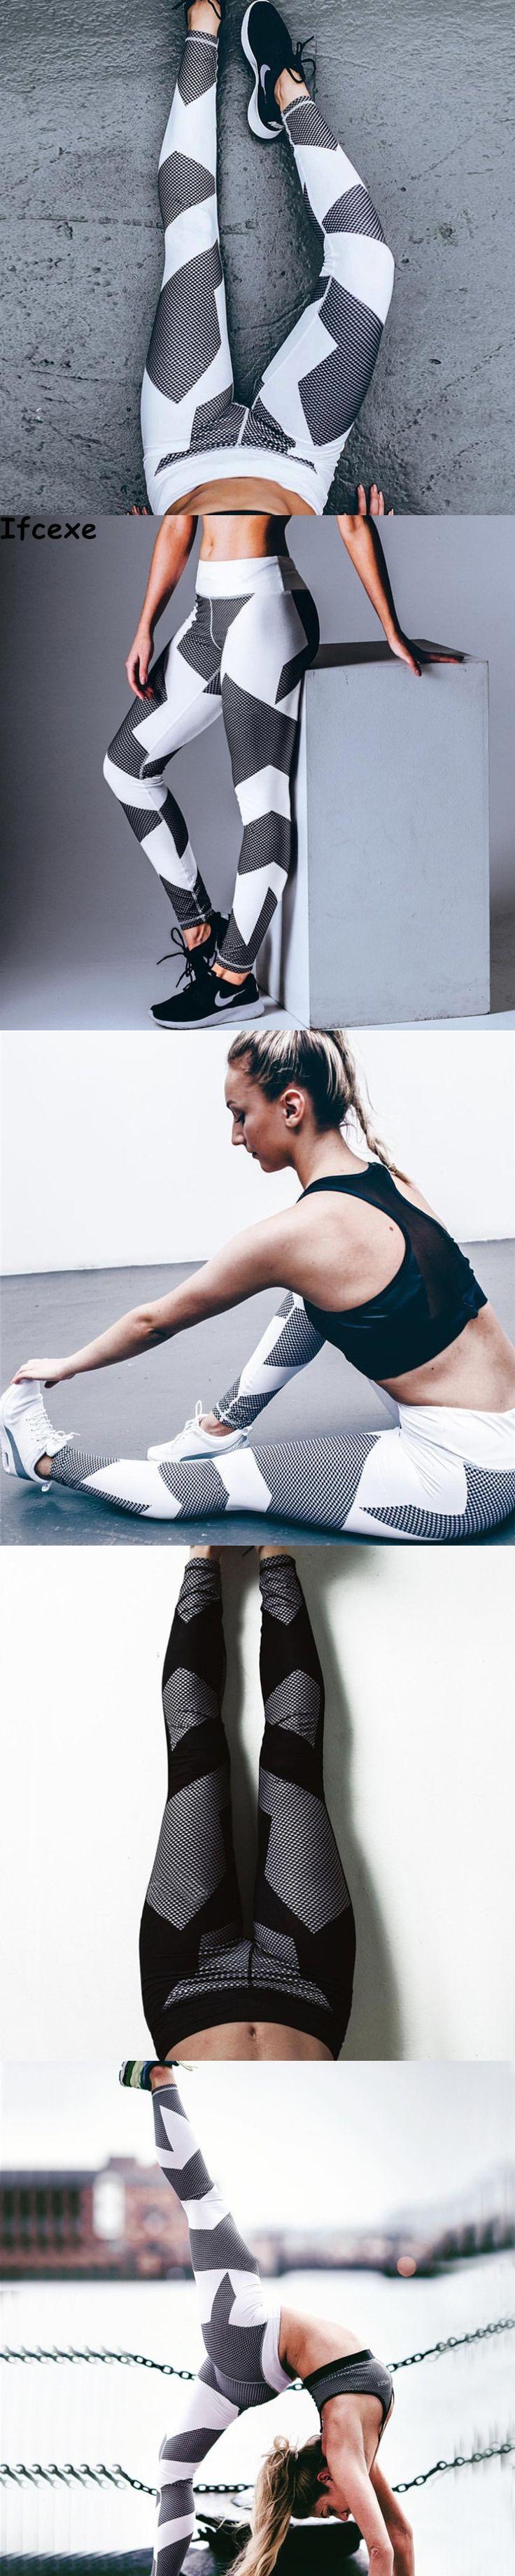 2017 new Pants Women Leggins Sport High Waist Hollow Women Fitness Pant Woman Sportswear Gym Leggings Sport Tights Women